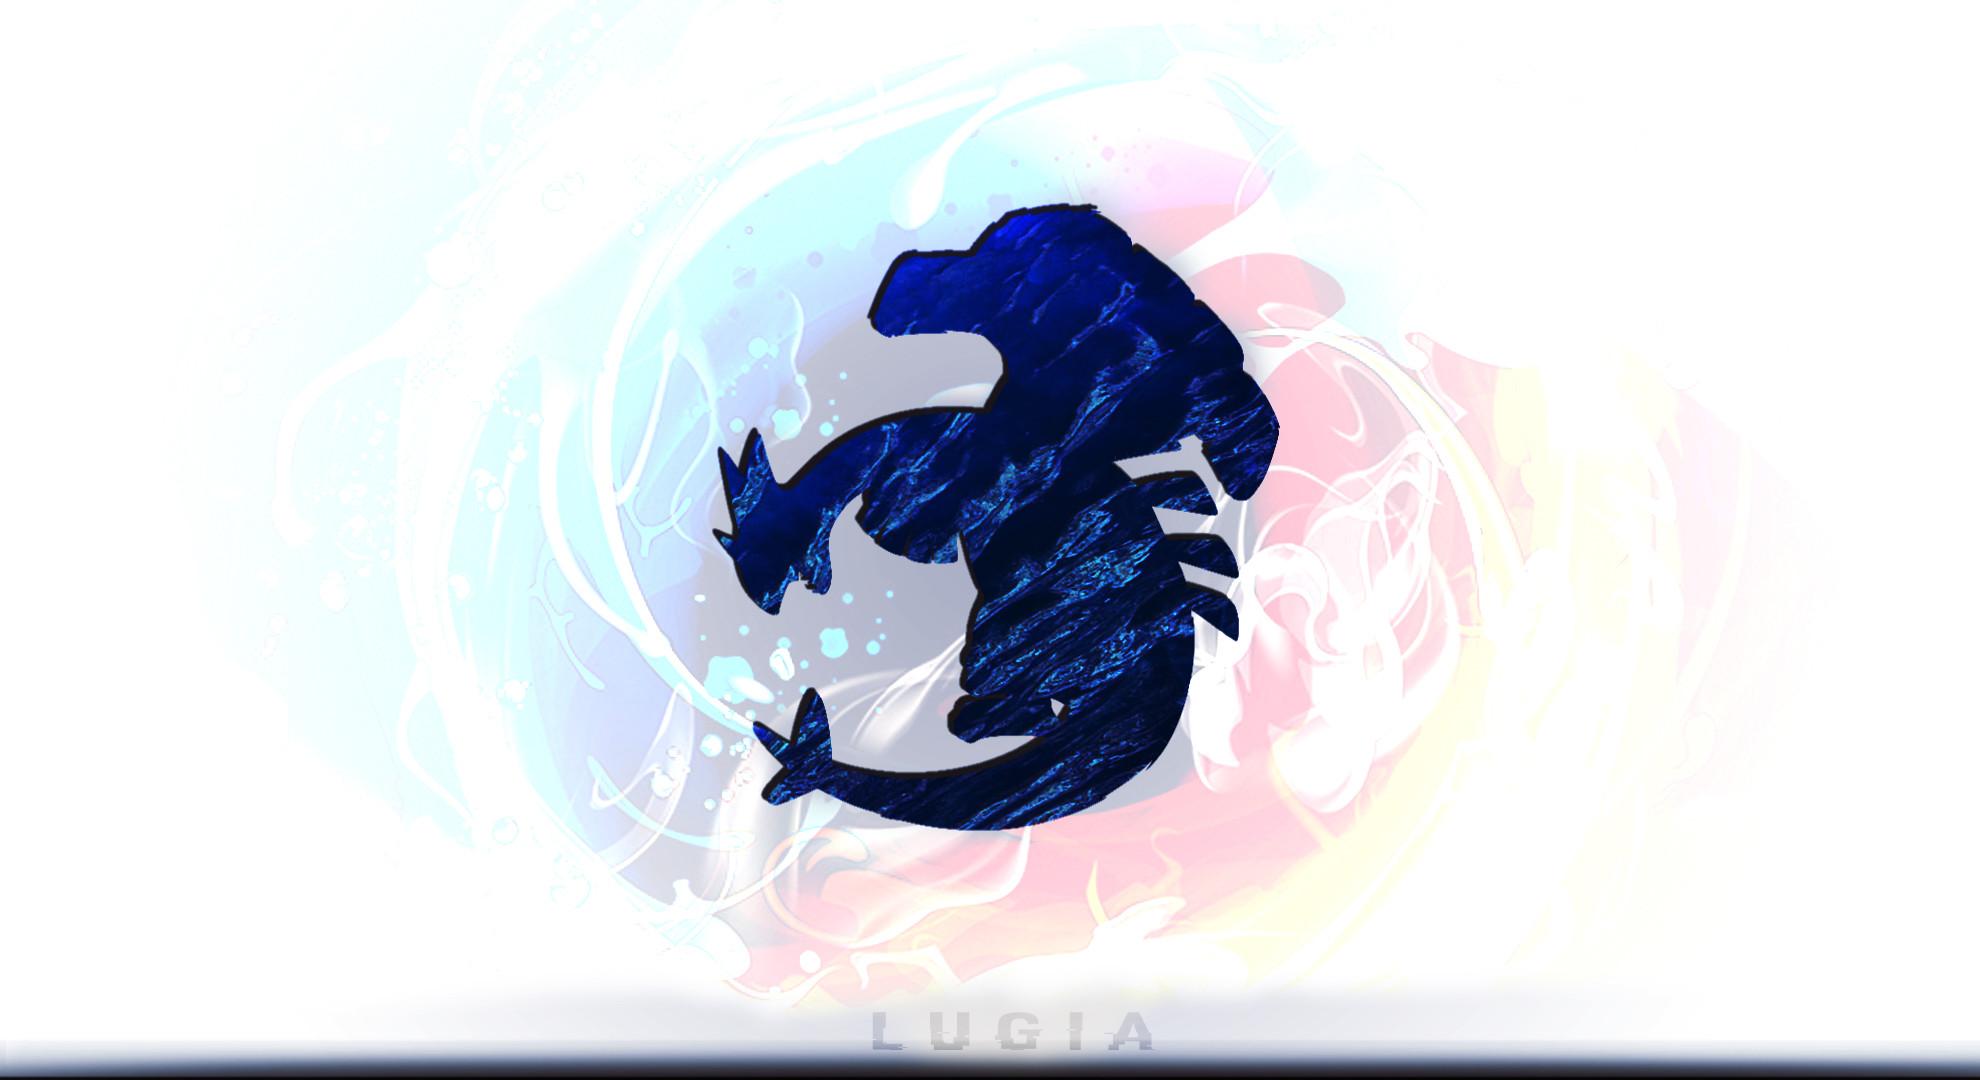 Lugia Wallpaper by DarkunePlays Lugia Wallpaper by DarkunePlays